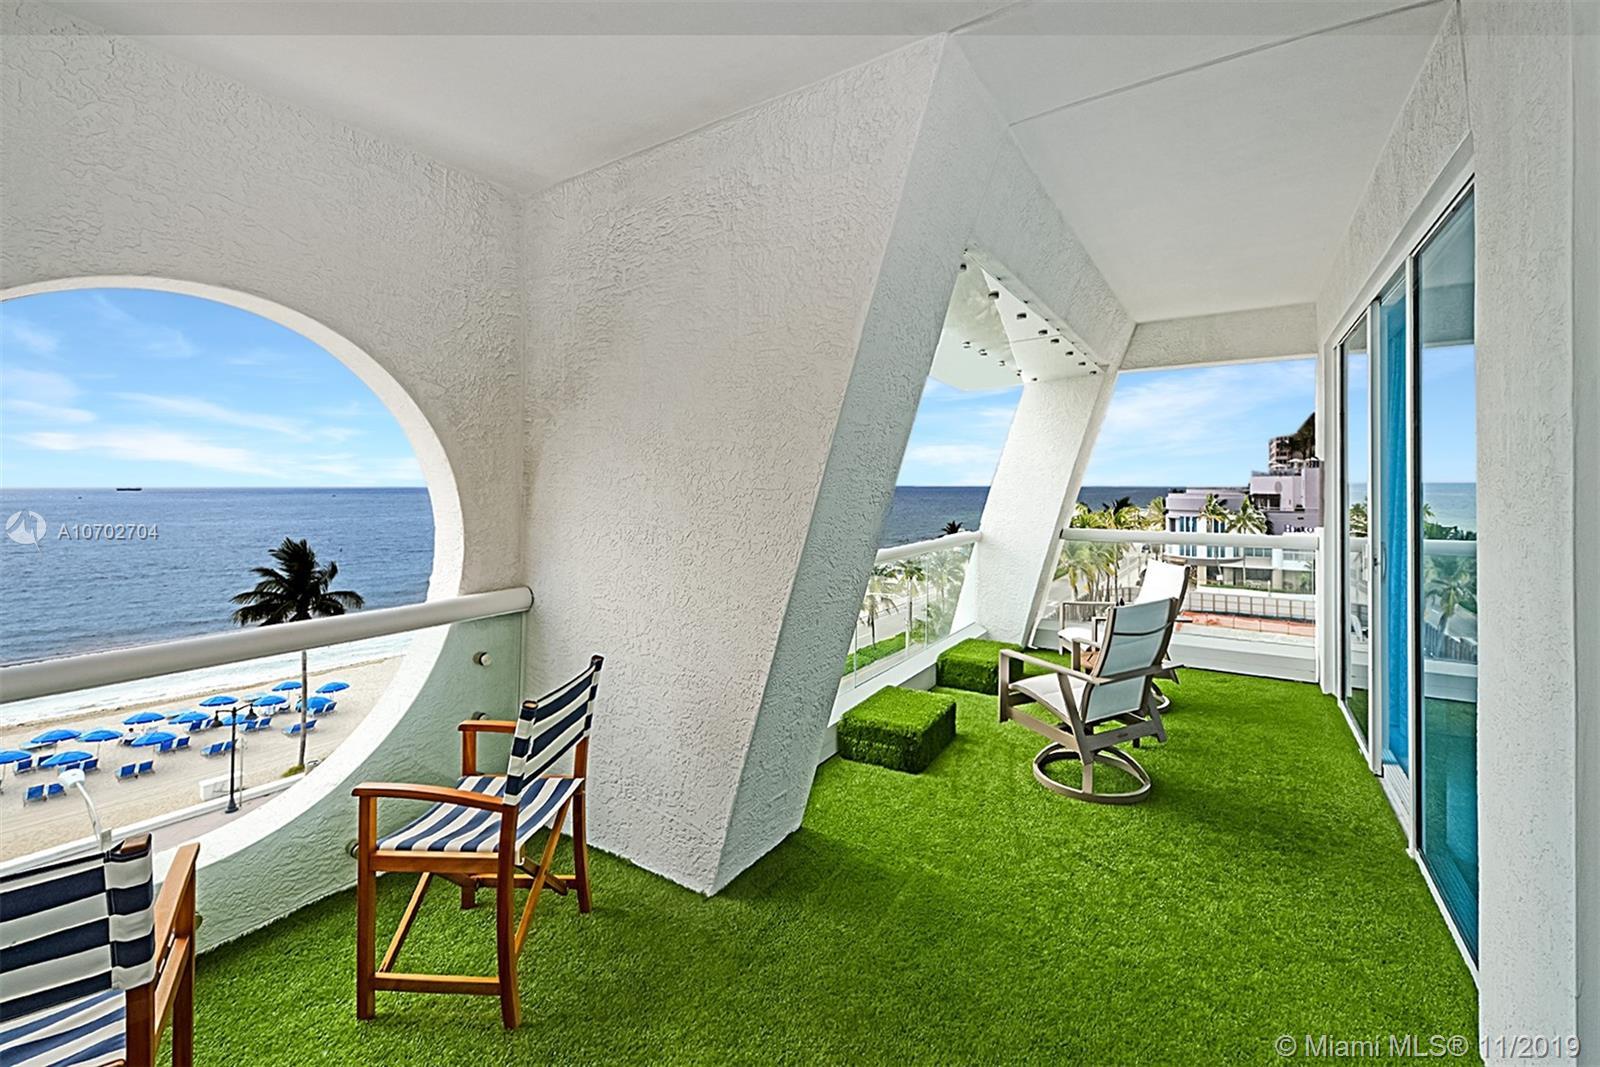 551 N Fort Lauderdale Beach Blvd R407, Fort Lauderdale, FL 33304